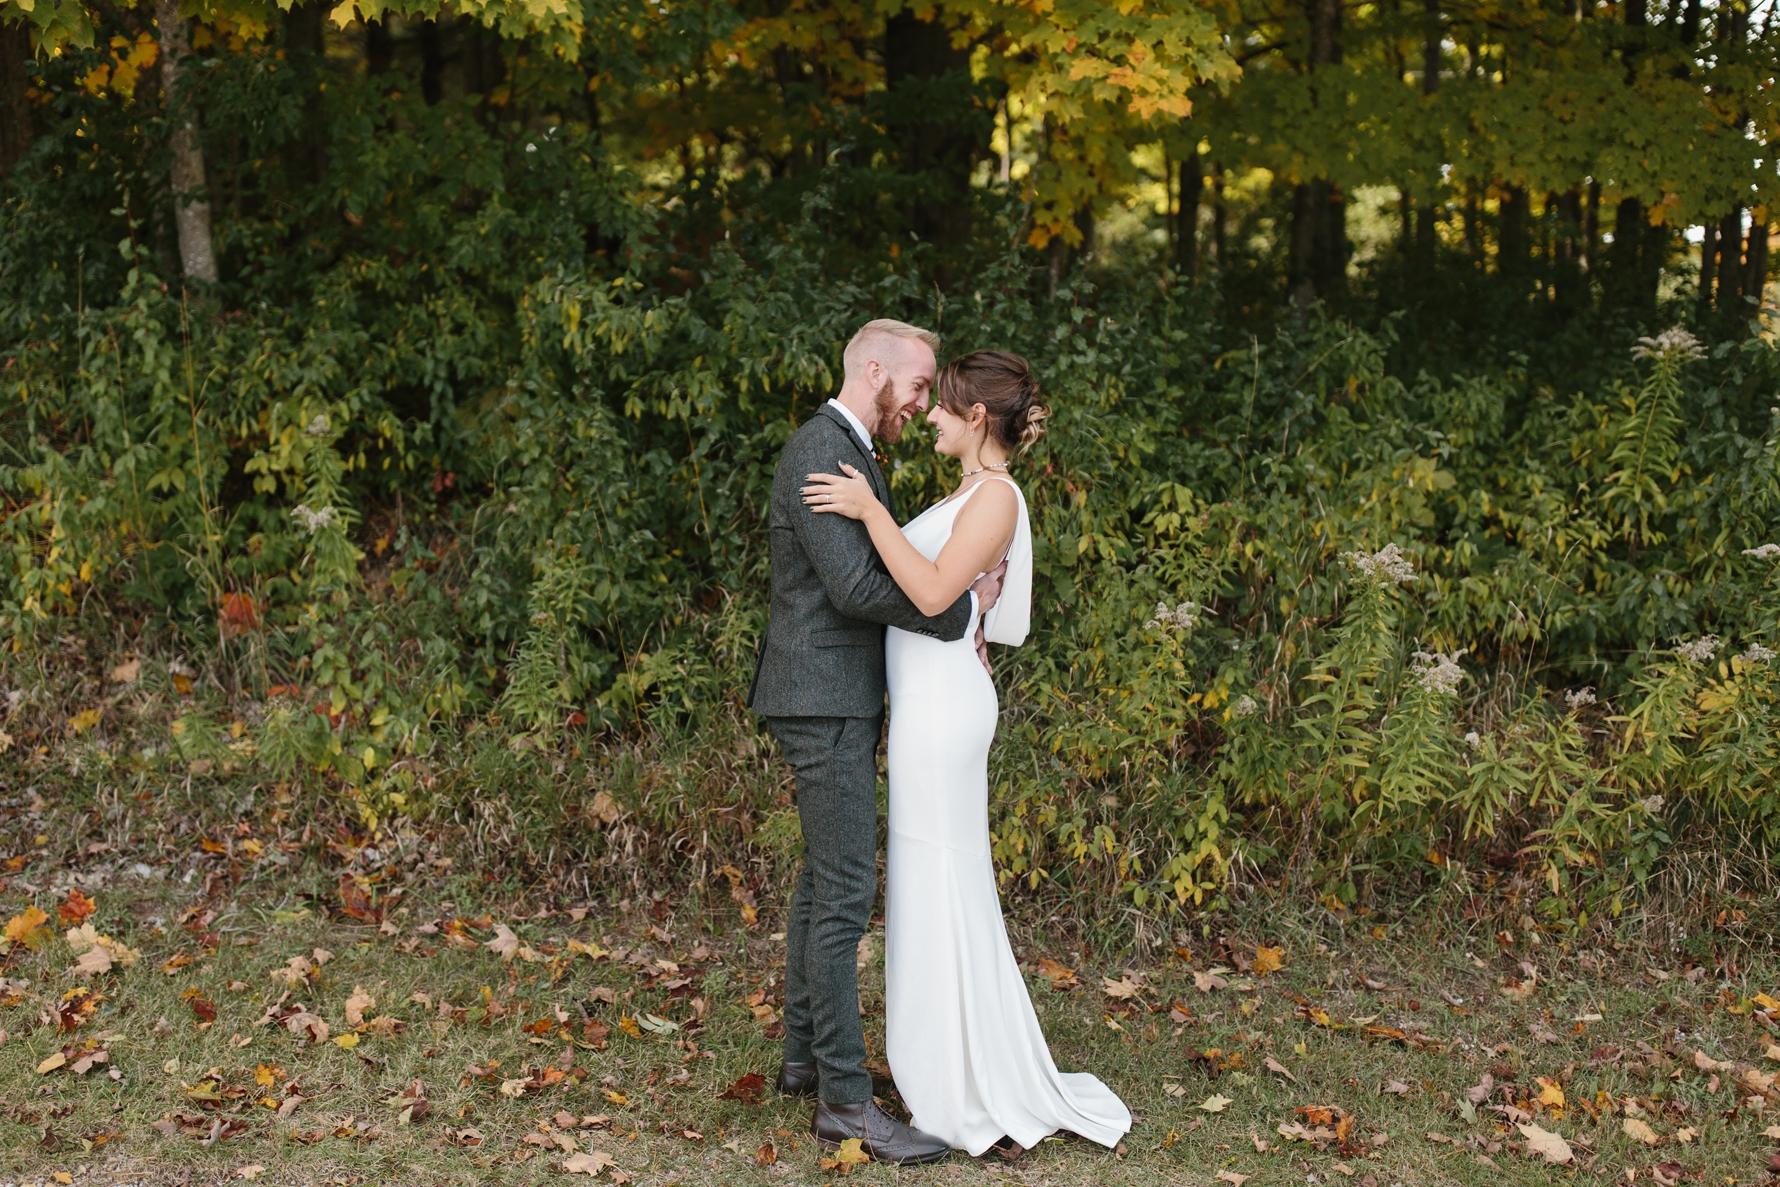 norris-traverse-city-wedding-14.JPG